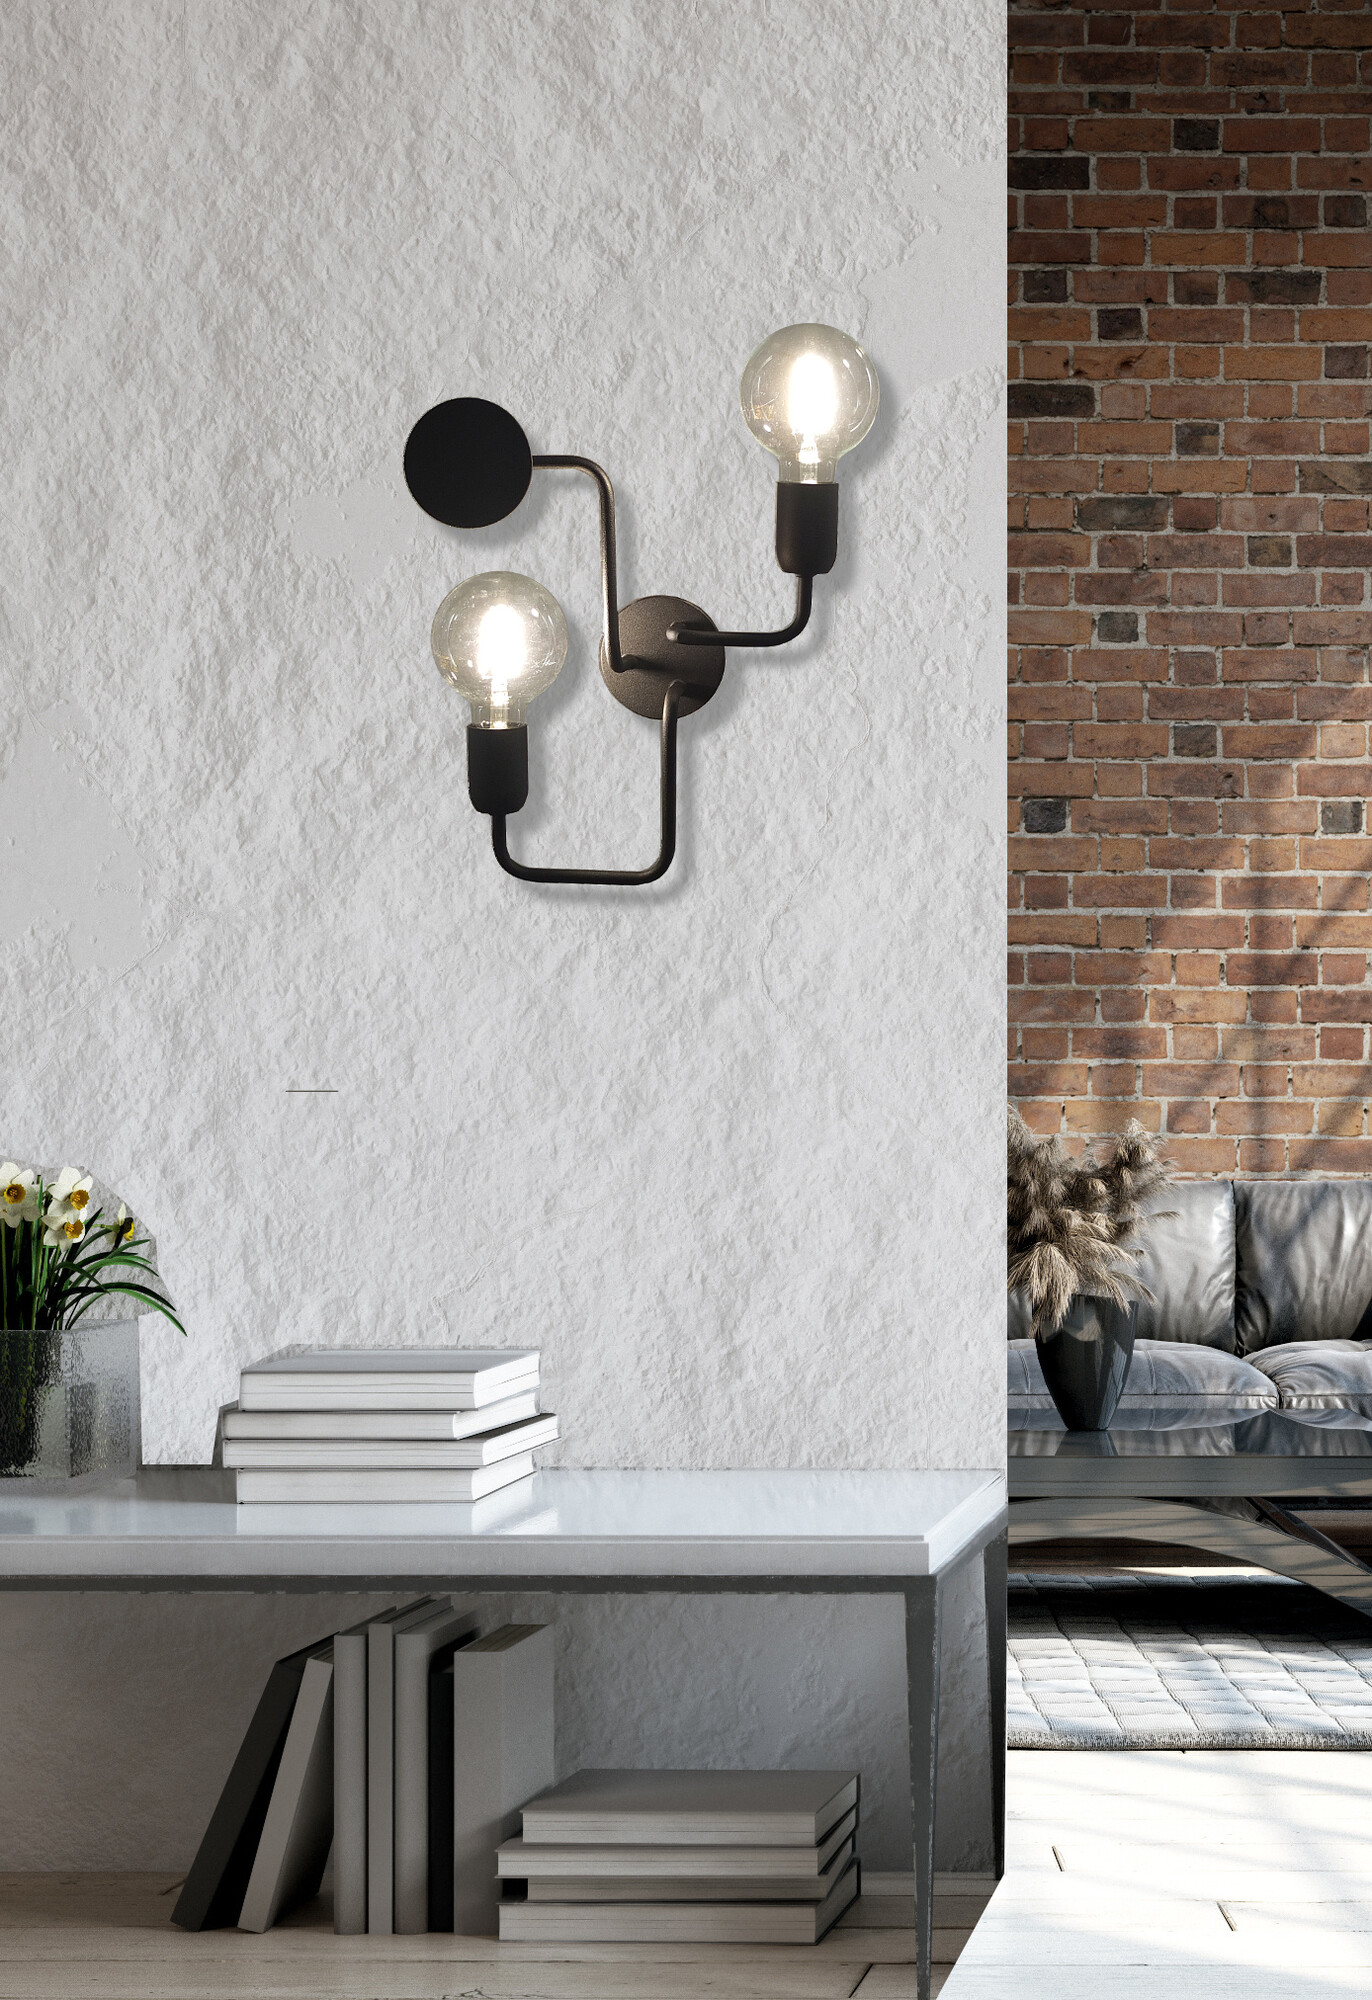 CIRCUIT Wandlamp E27 2x Zwart